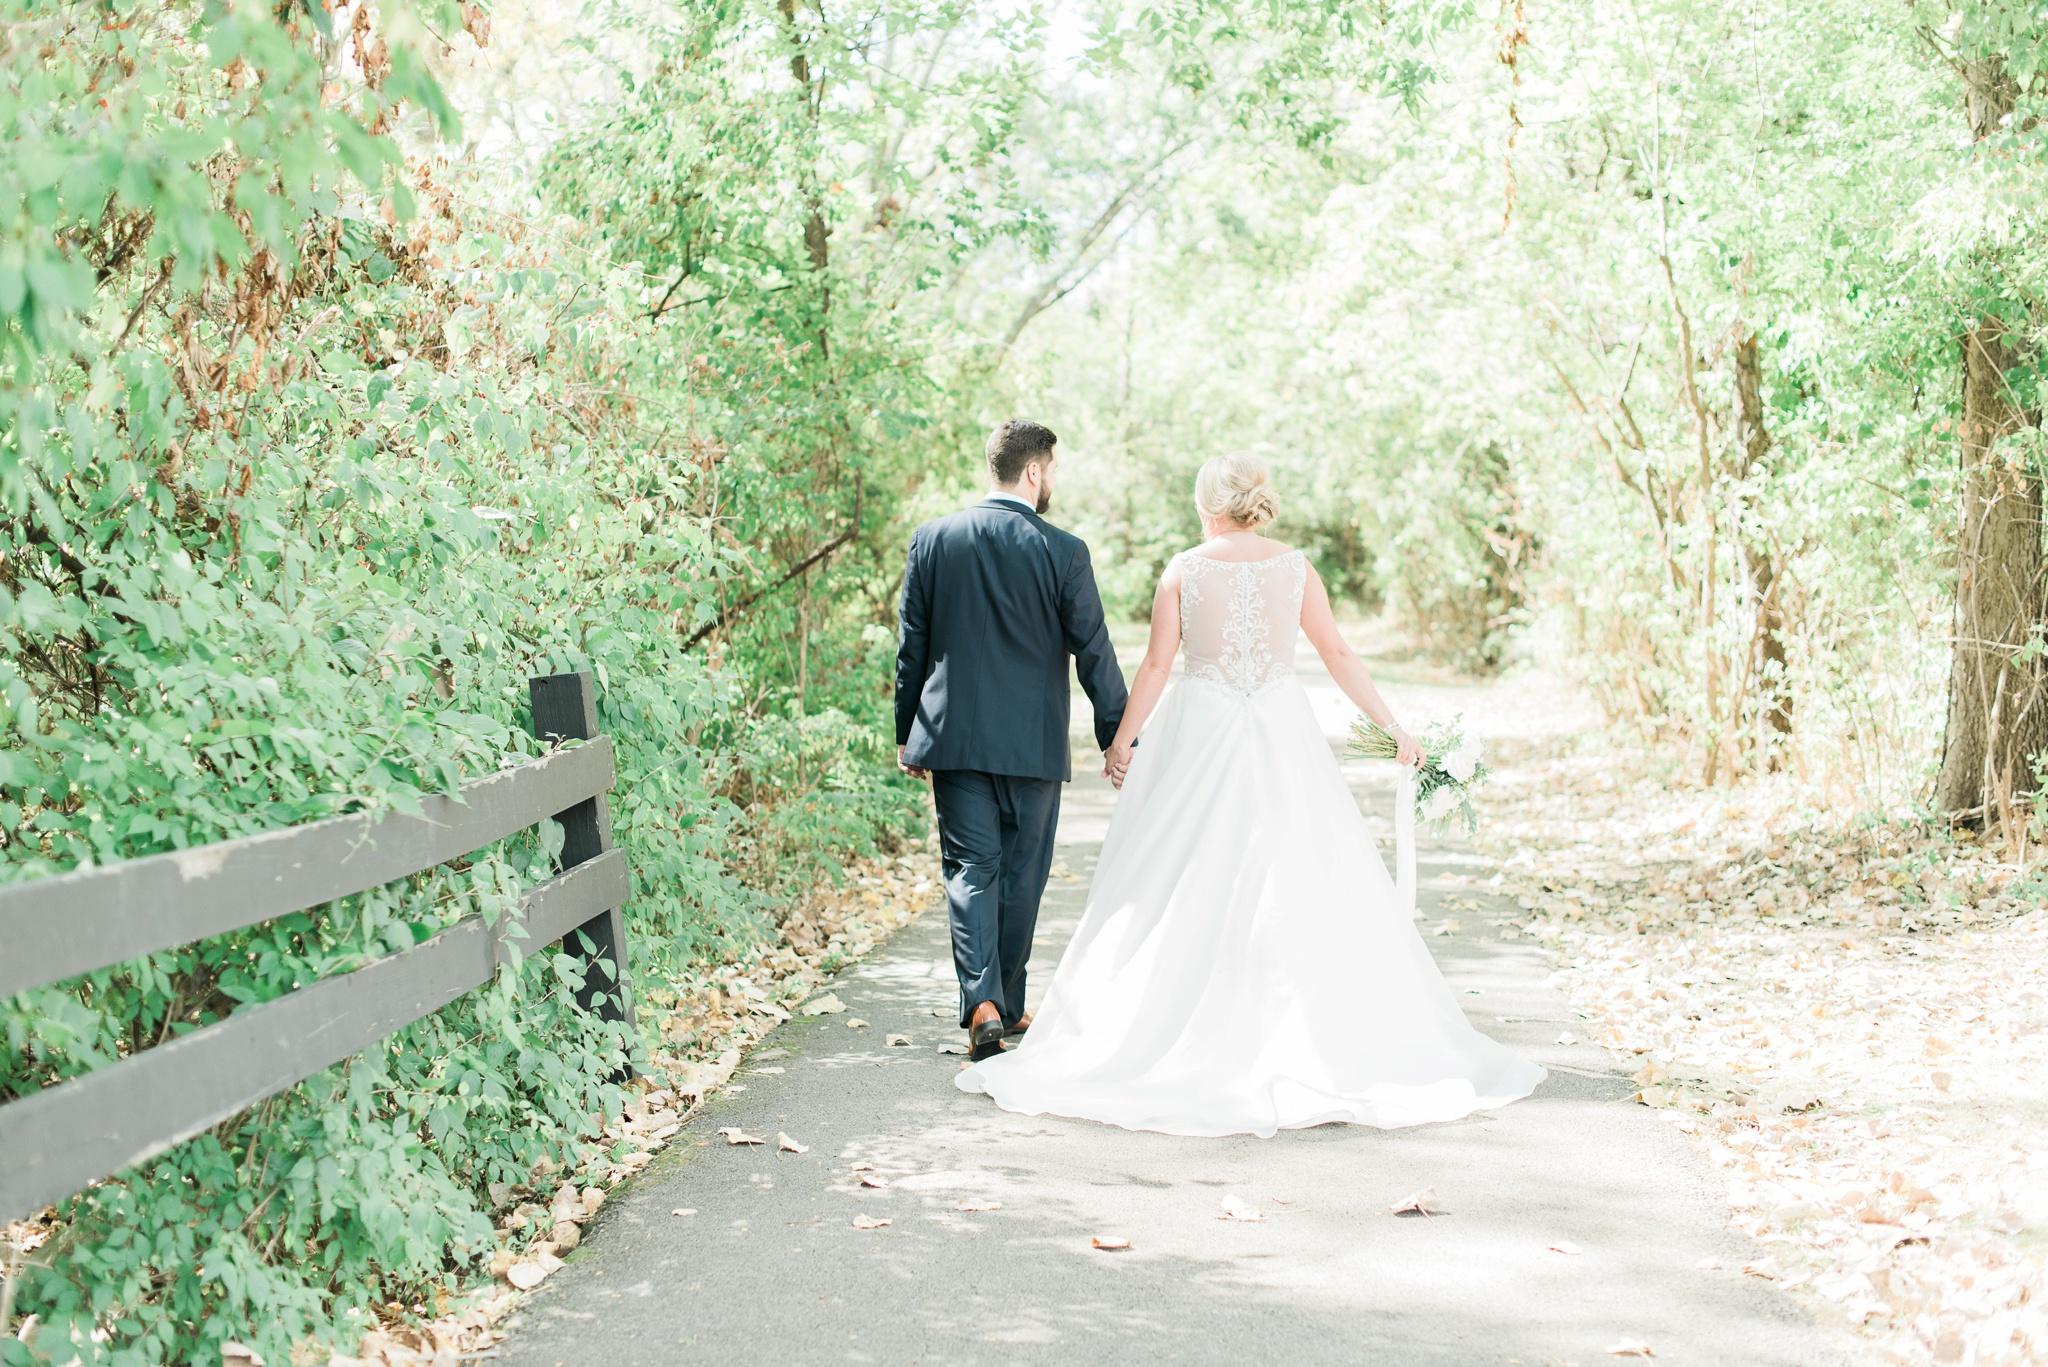 aladdin-shrine-center-wedding-grove-city-ohio-amber-jared_0038.jpg